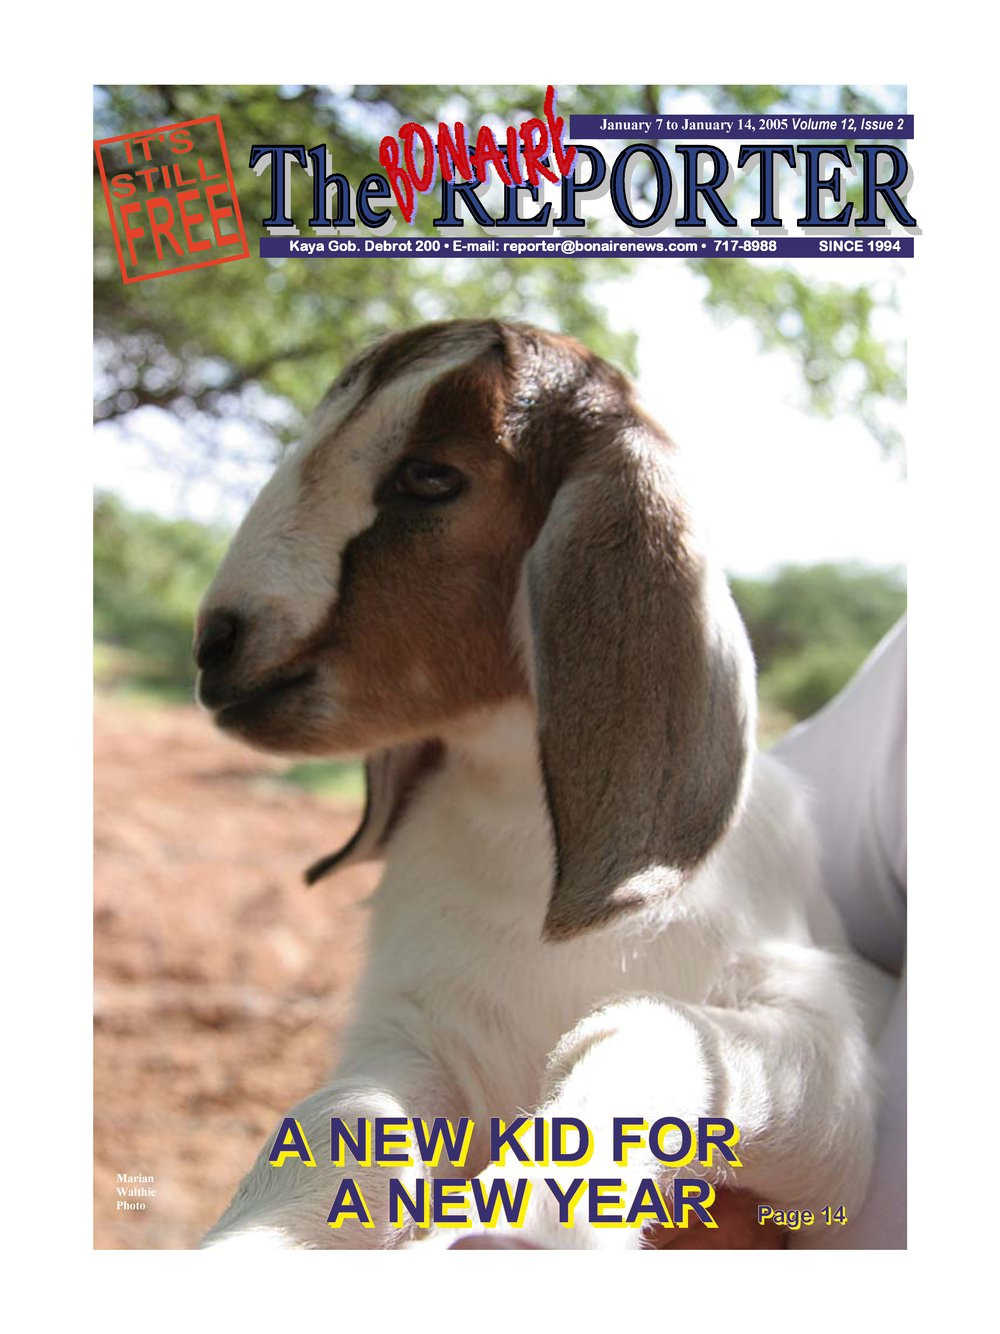 Bonaire reporter - Page 1